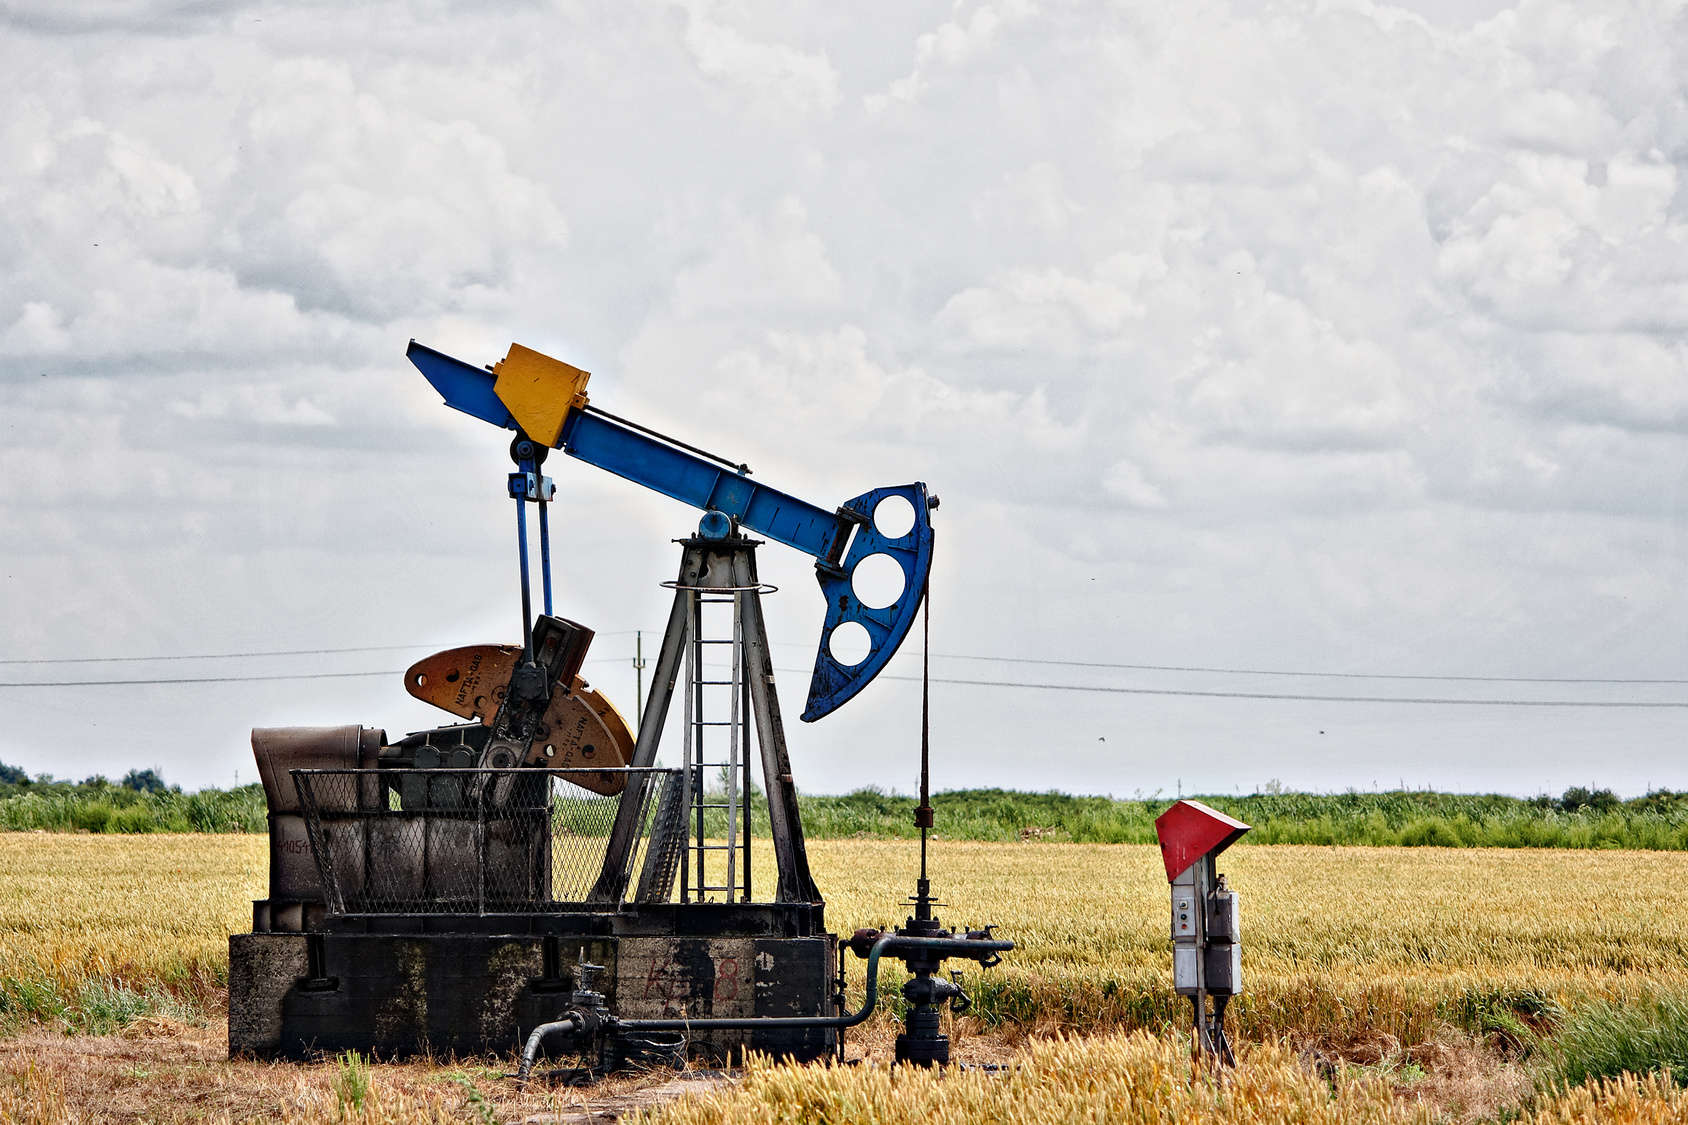 Oil pump, Oil industry equipment, industrial machine for petroleum